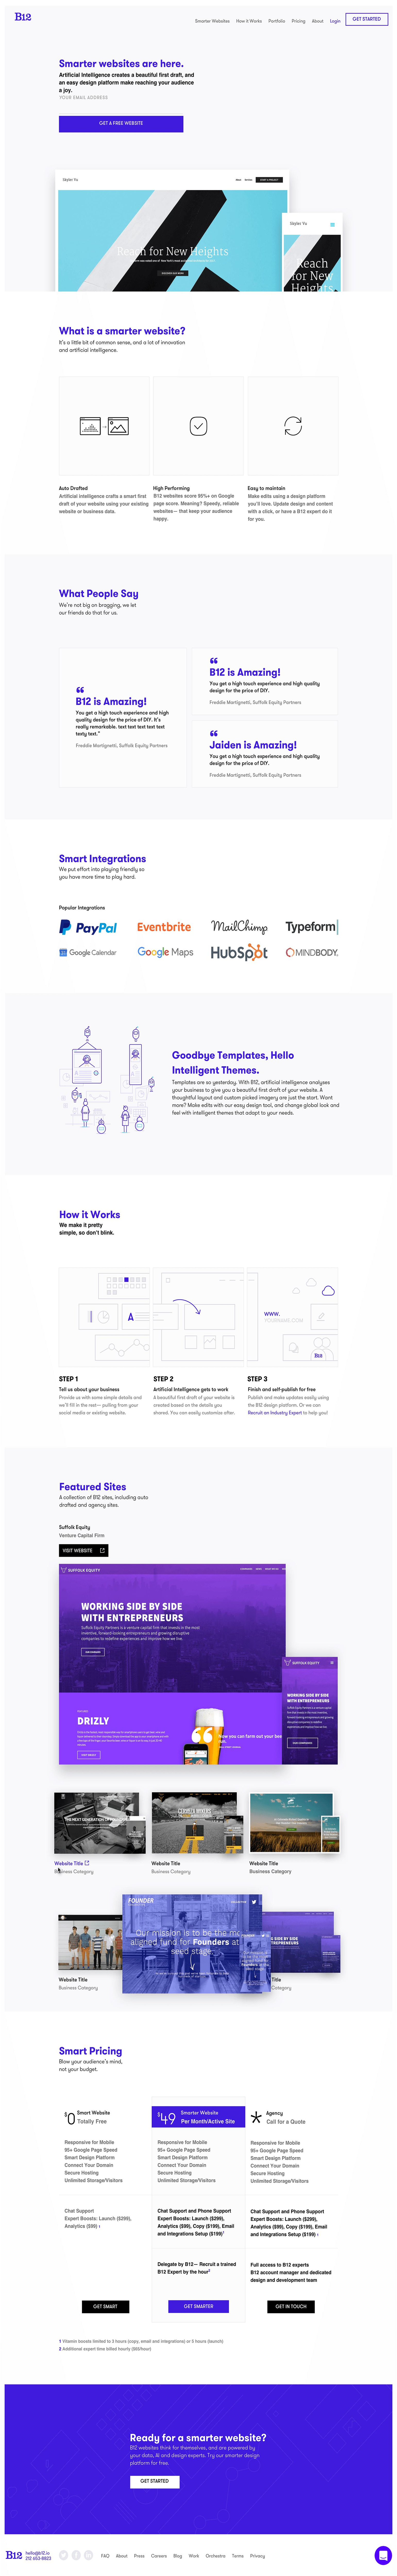 B12 Homepage